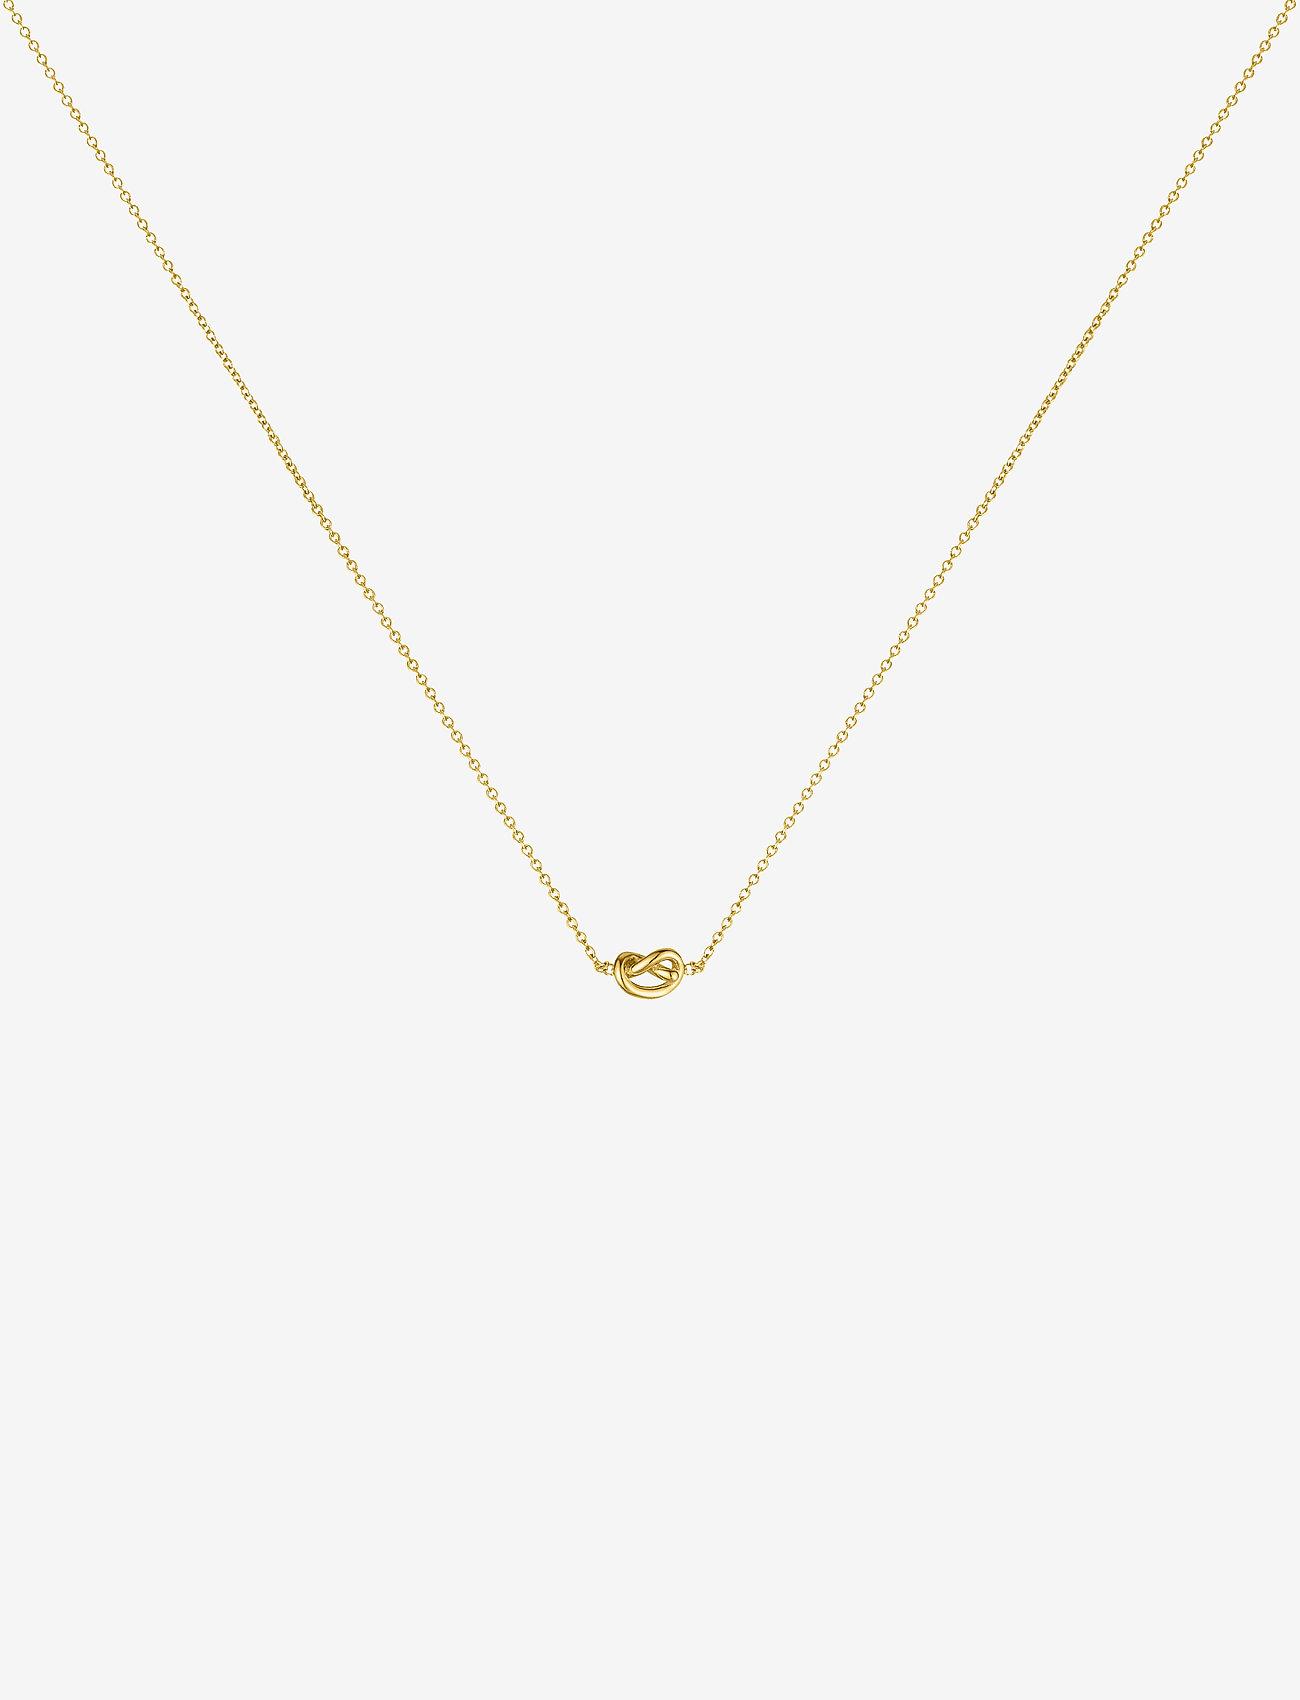 SOPHIE by SOPHIE - Knot necklace - kaklarotas ar kulonu - gold - 0